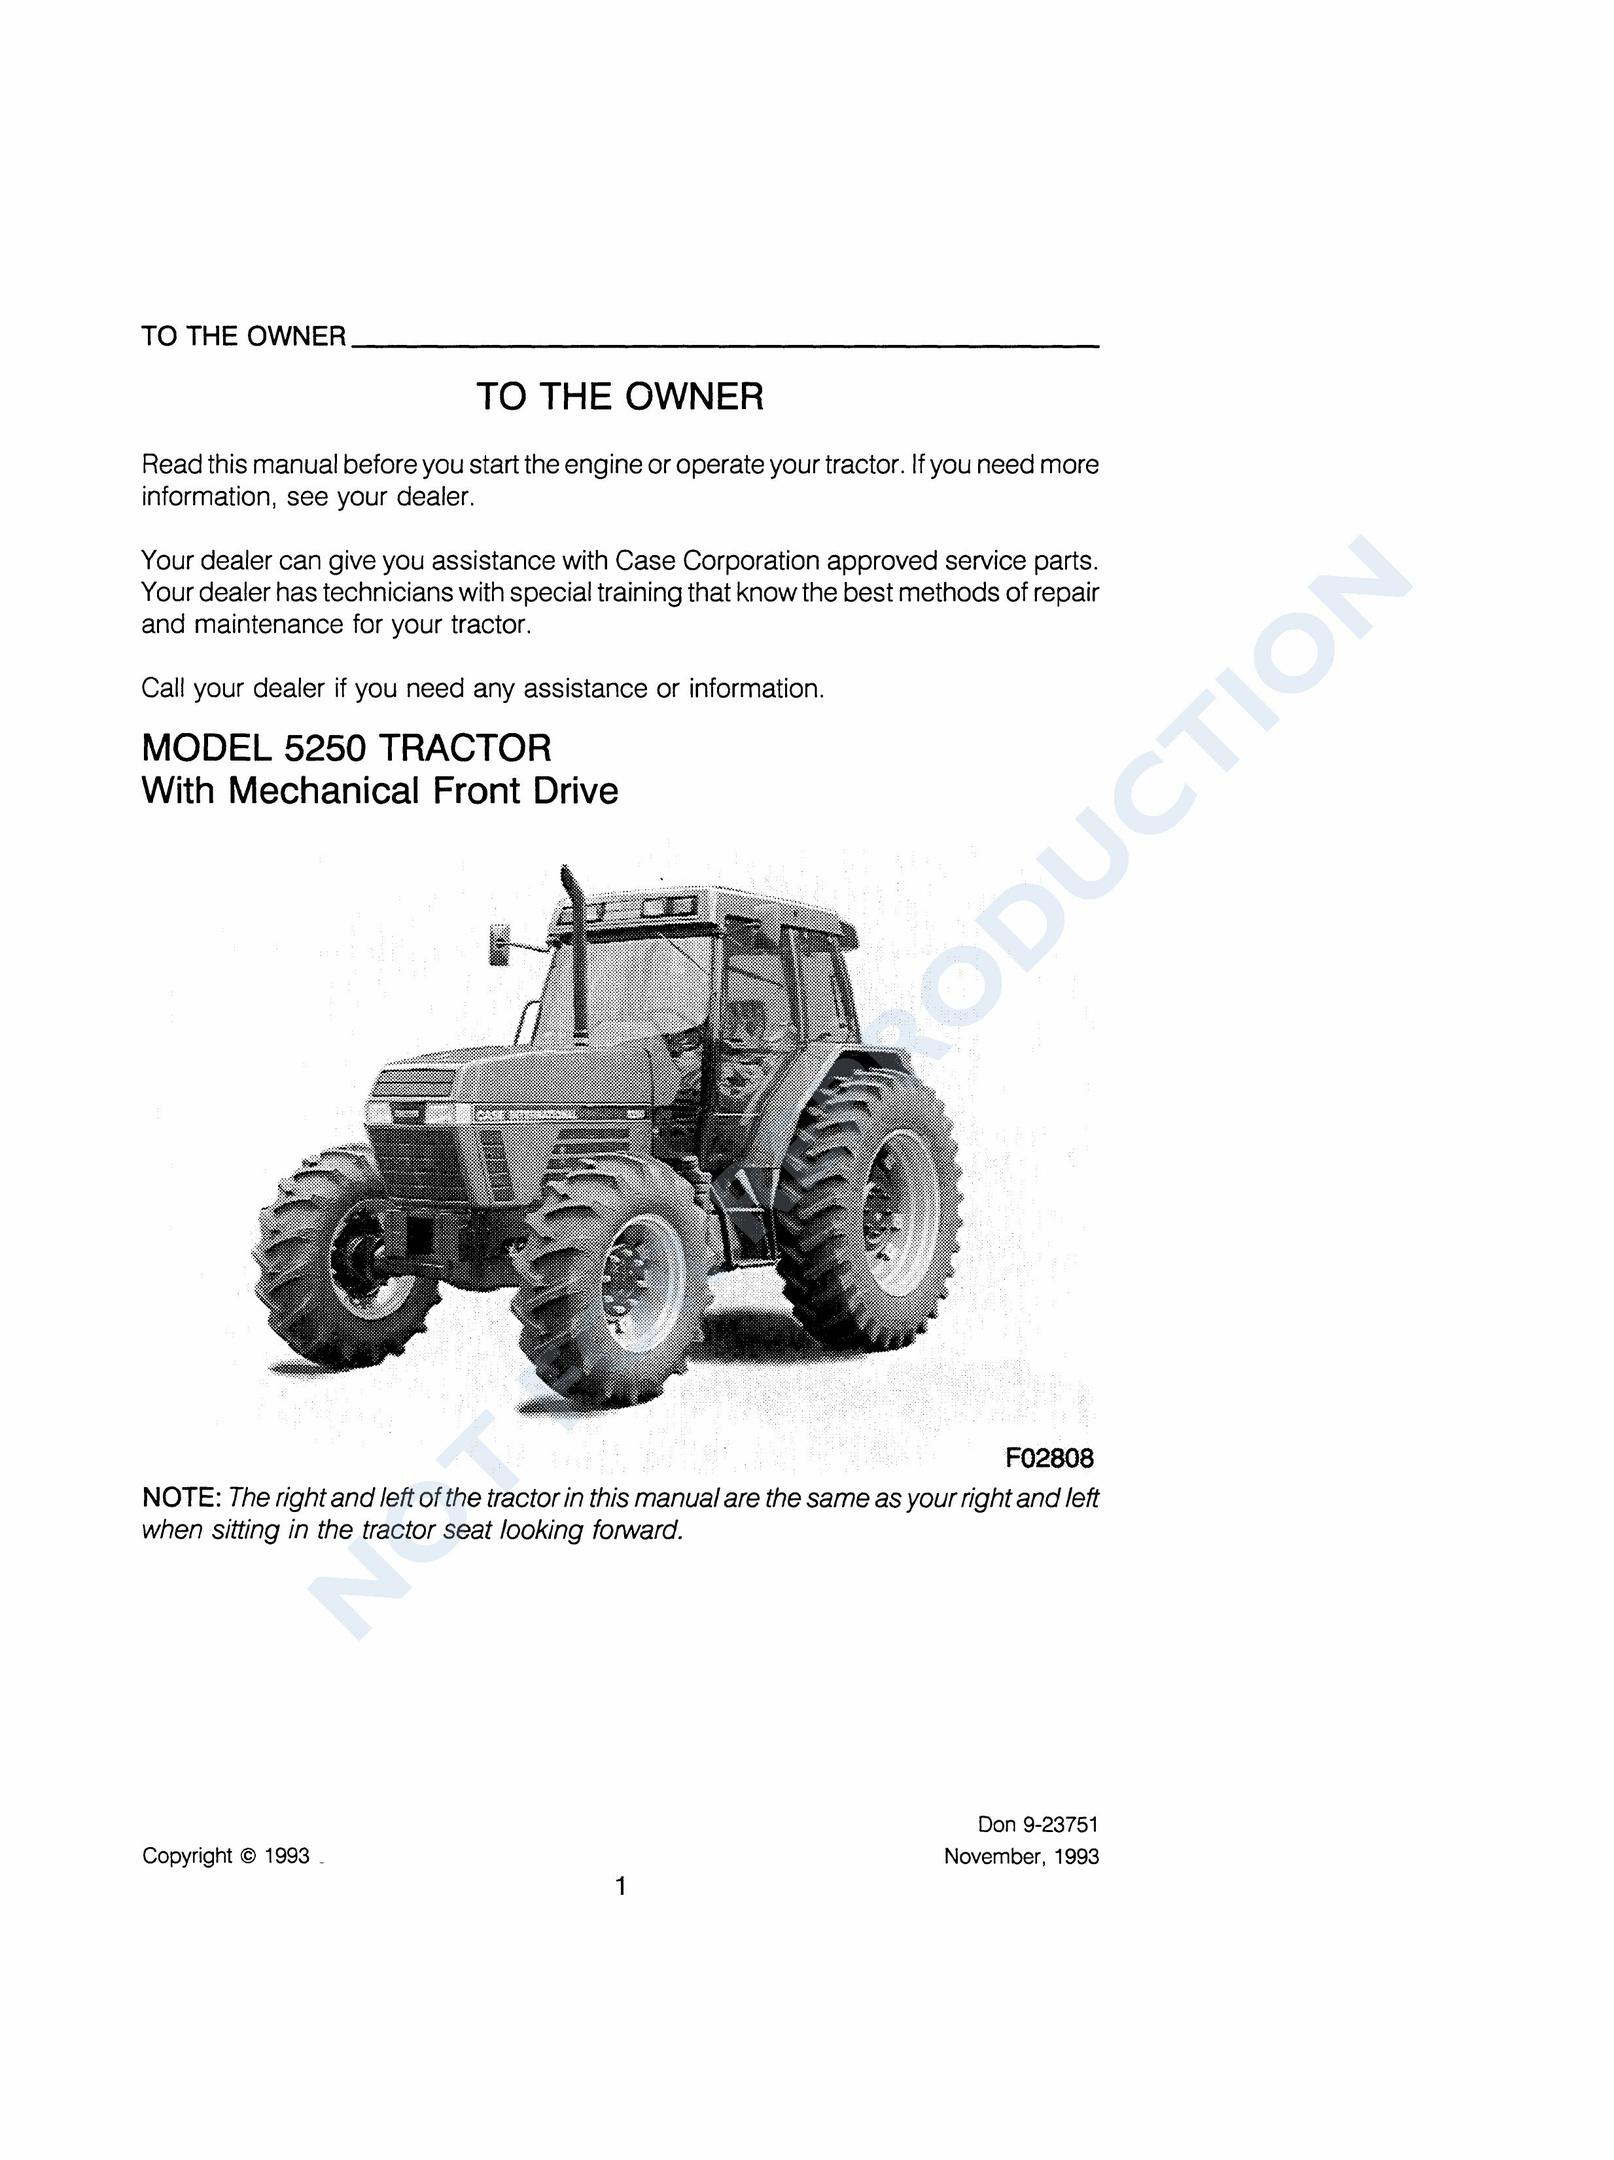 medium resolution of case ih 5250 service manual basic instruction manual u2022 rh ryanshtuff co 1206 ih tractor wiring